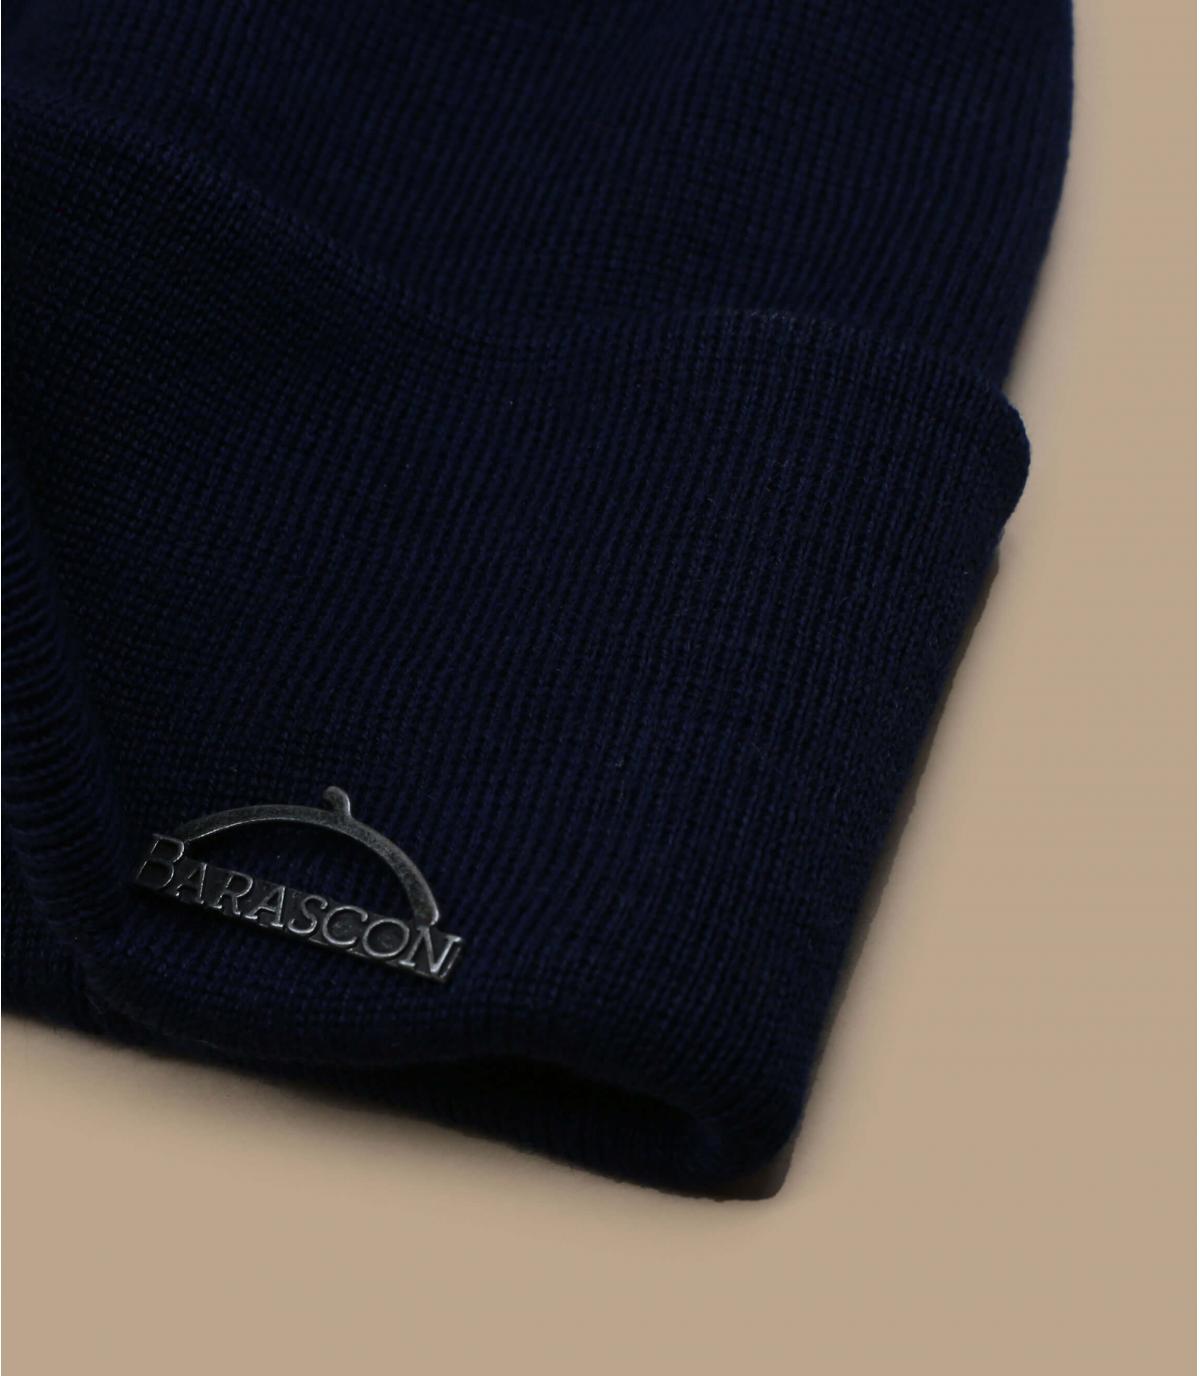 Detalles Barascon Beanie Wool Acryl navy imagen 2